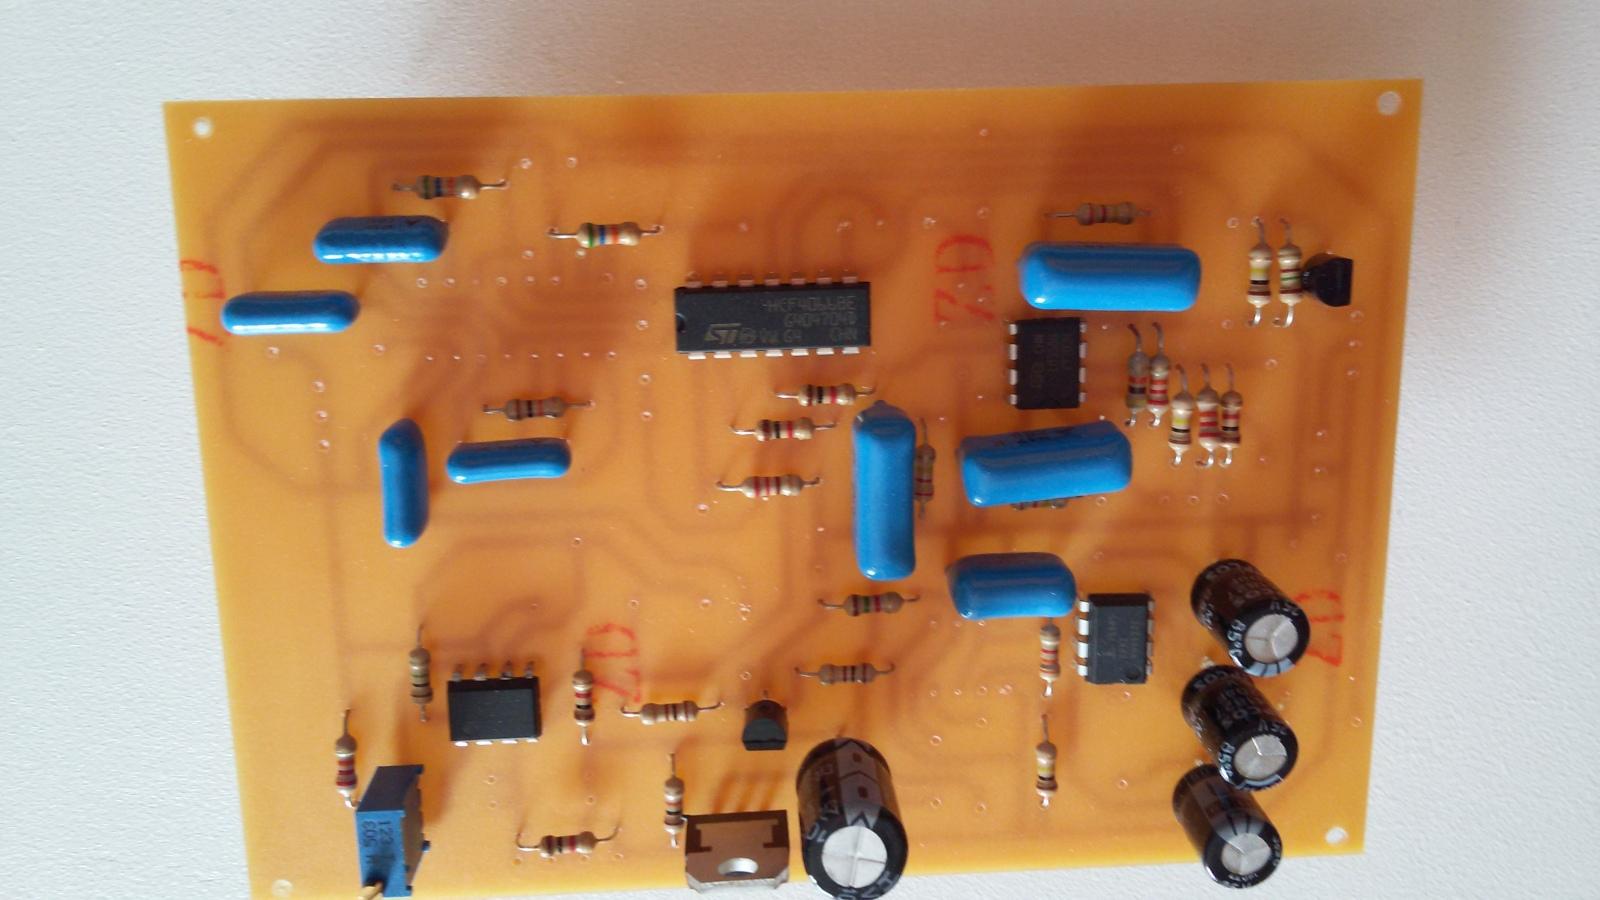 Detector Surf Pi. - Página 9 308a3ip